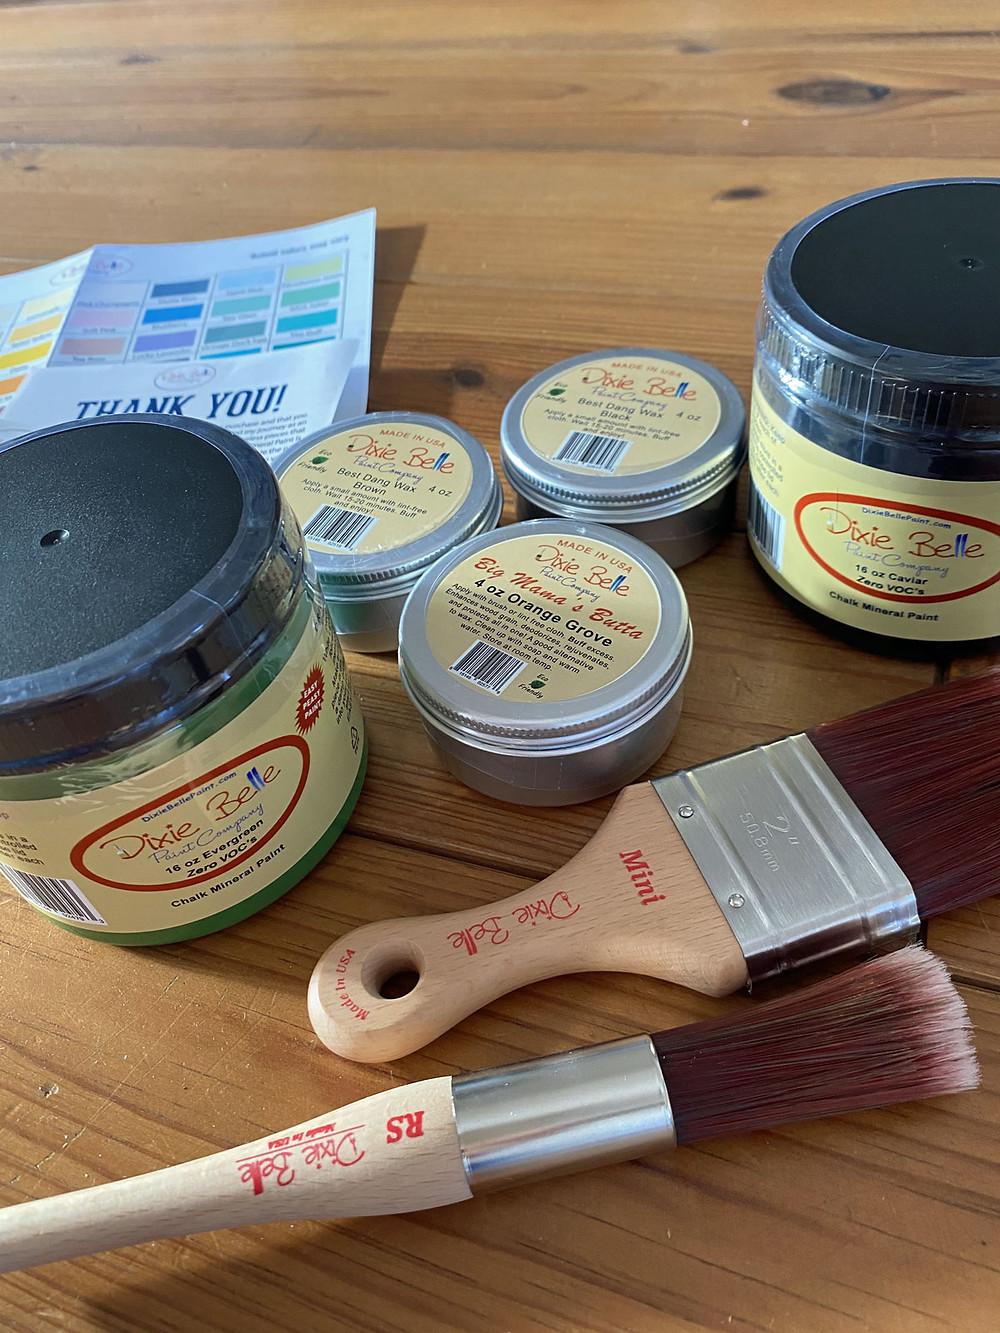 Dixie Belle Paint Kreidefarbe aus USA im Test bei gonepaintin